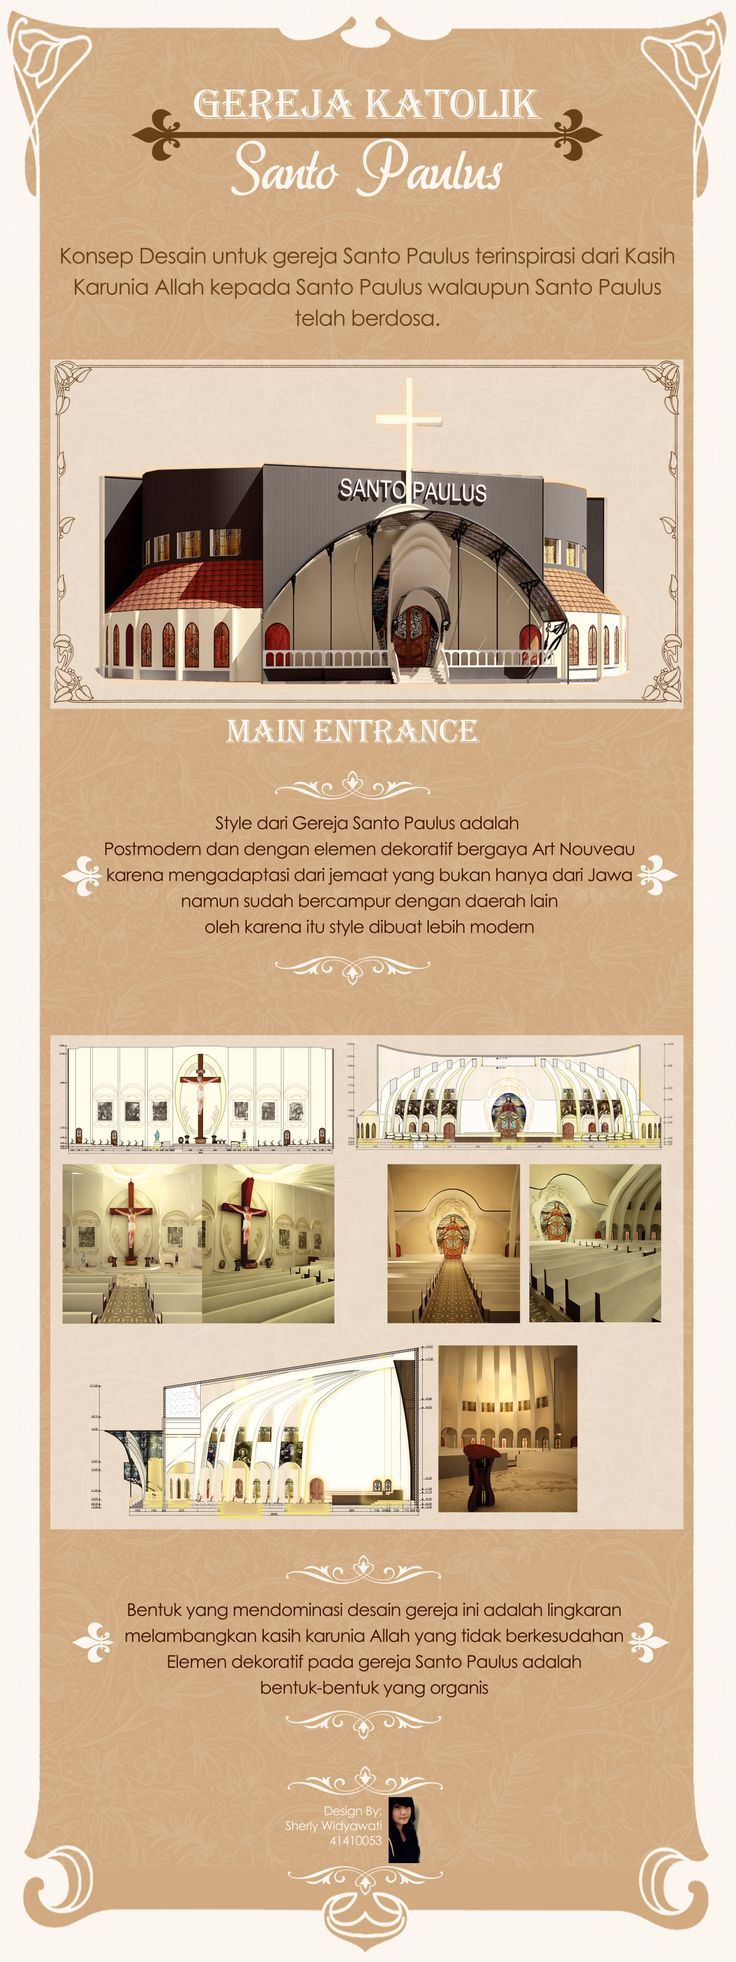 #church #saintpaul #interiordesign #artnouveau #postmodern